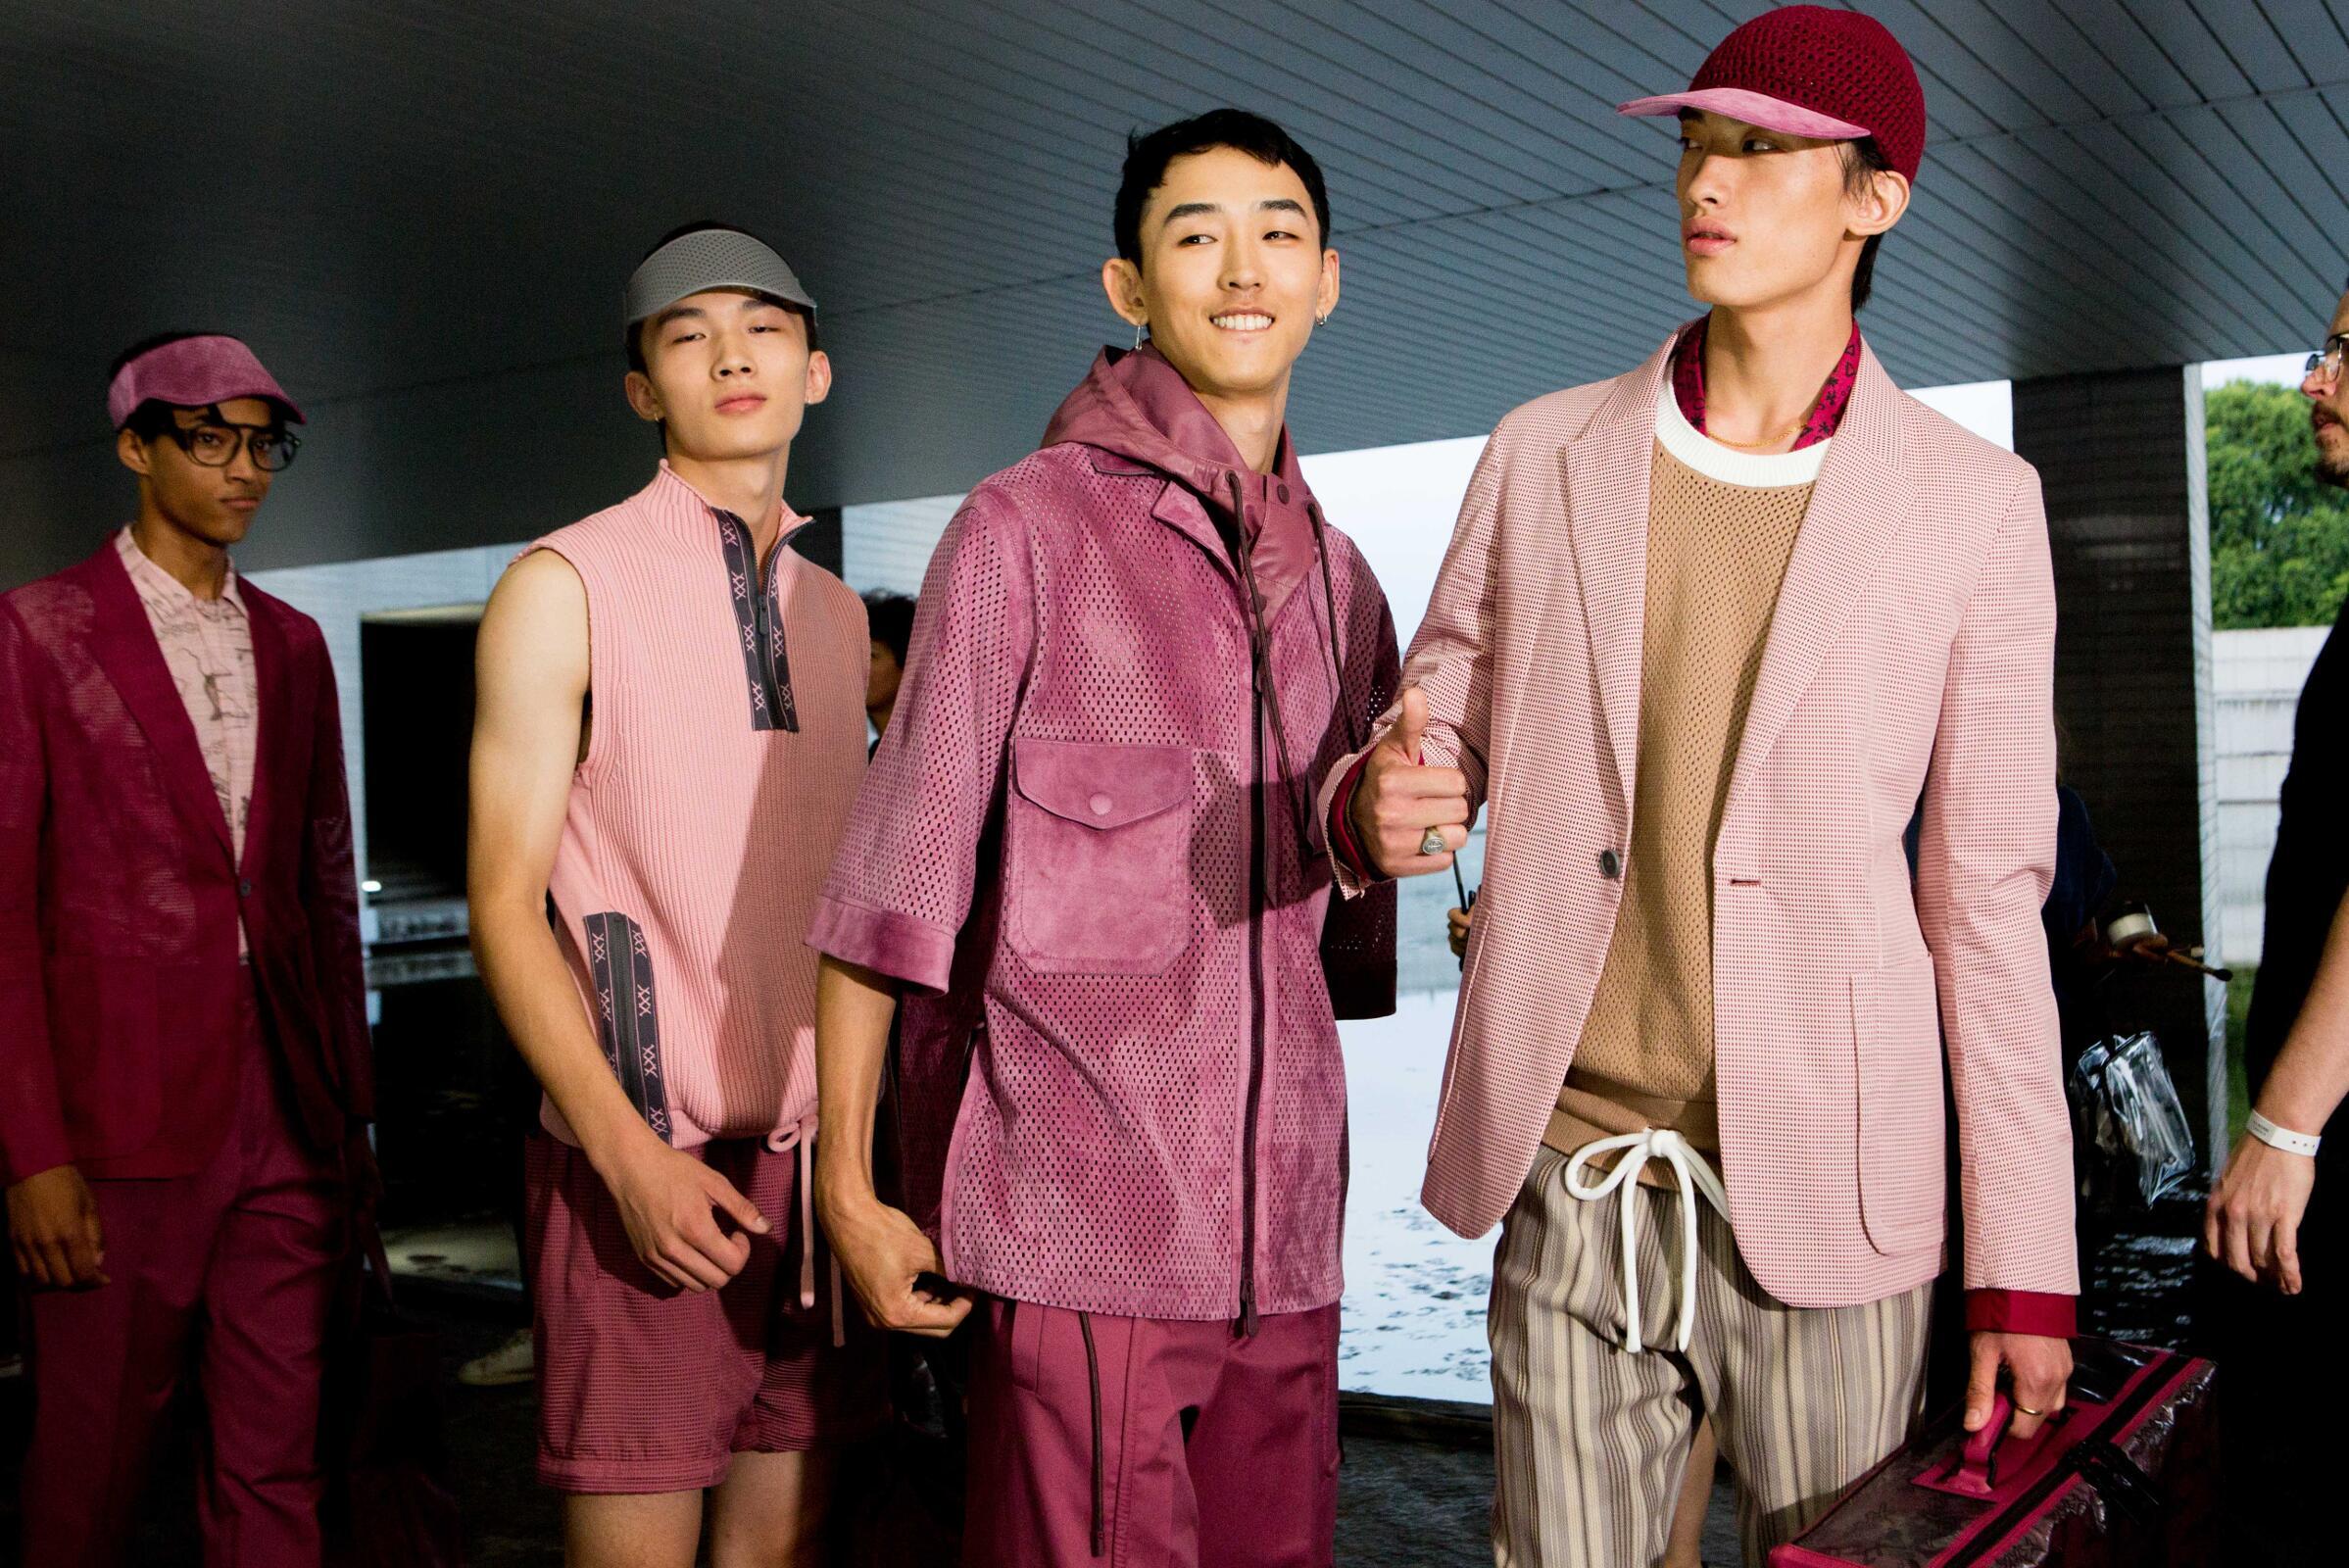 Backstage Ermenegildo Zegna Couture Fashion Trends 2019